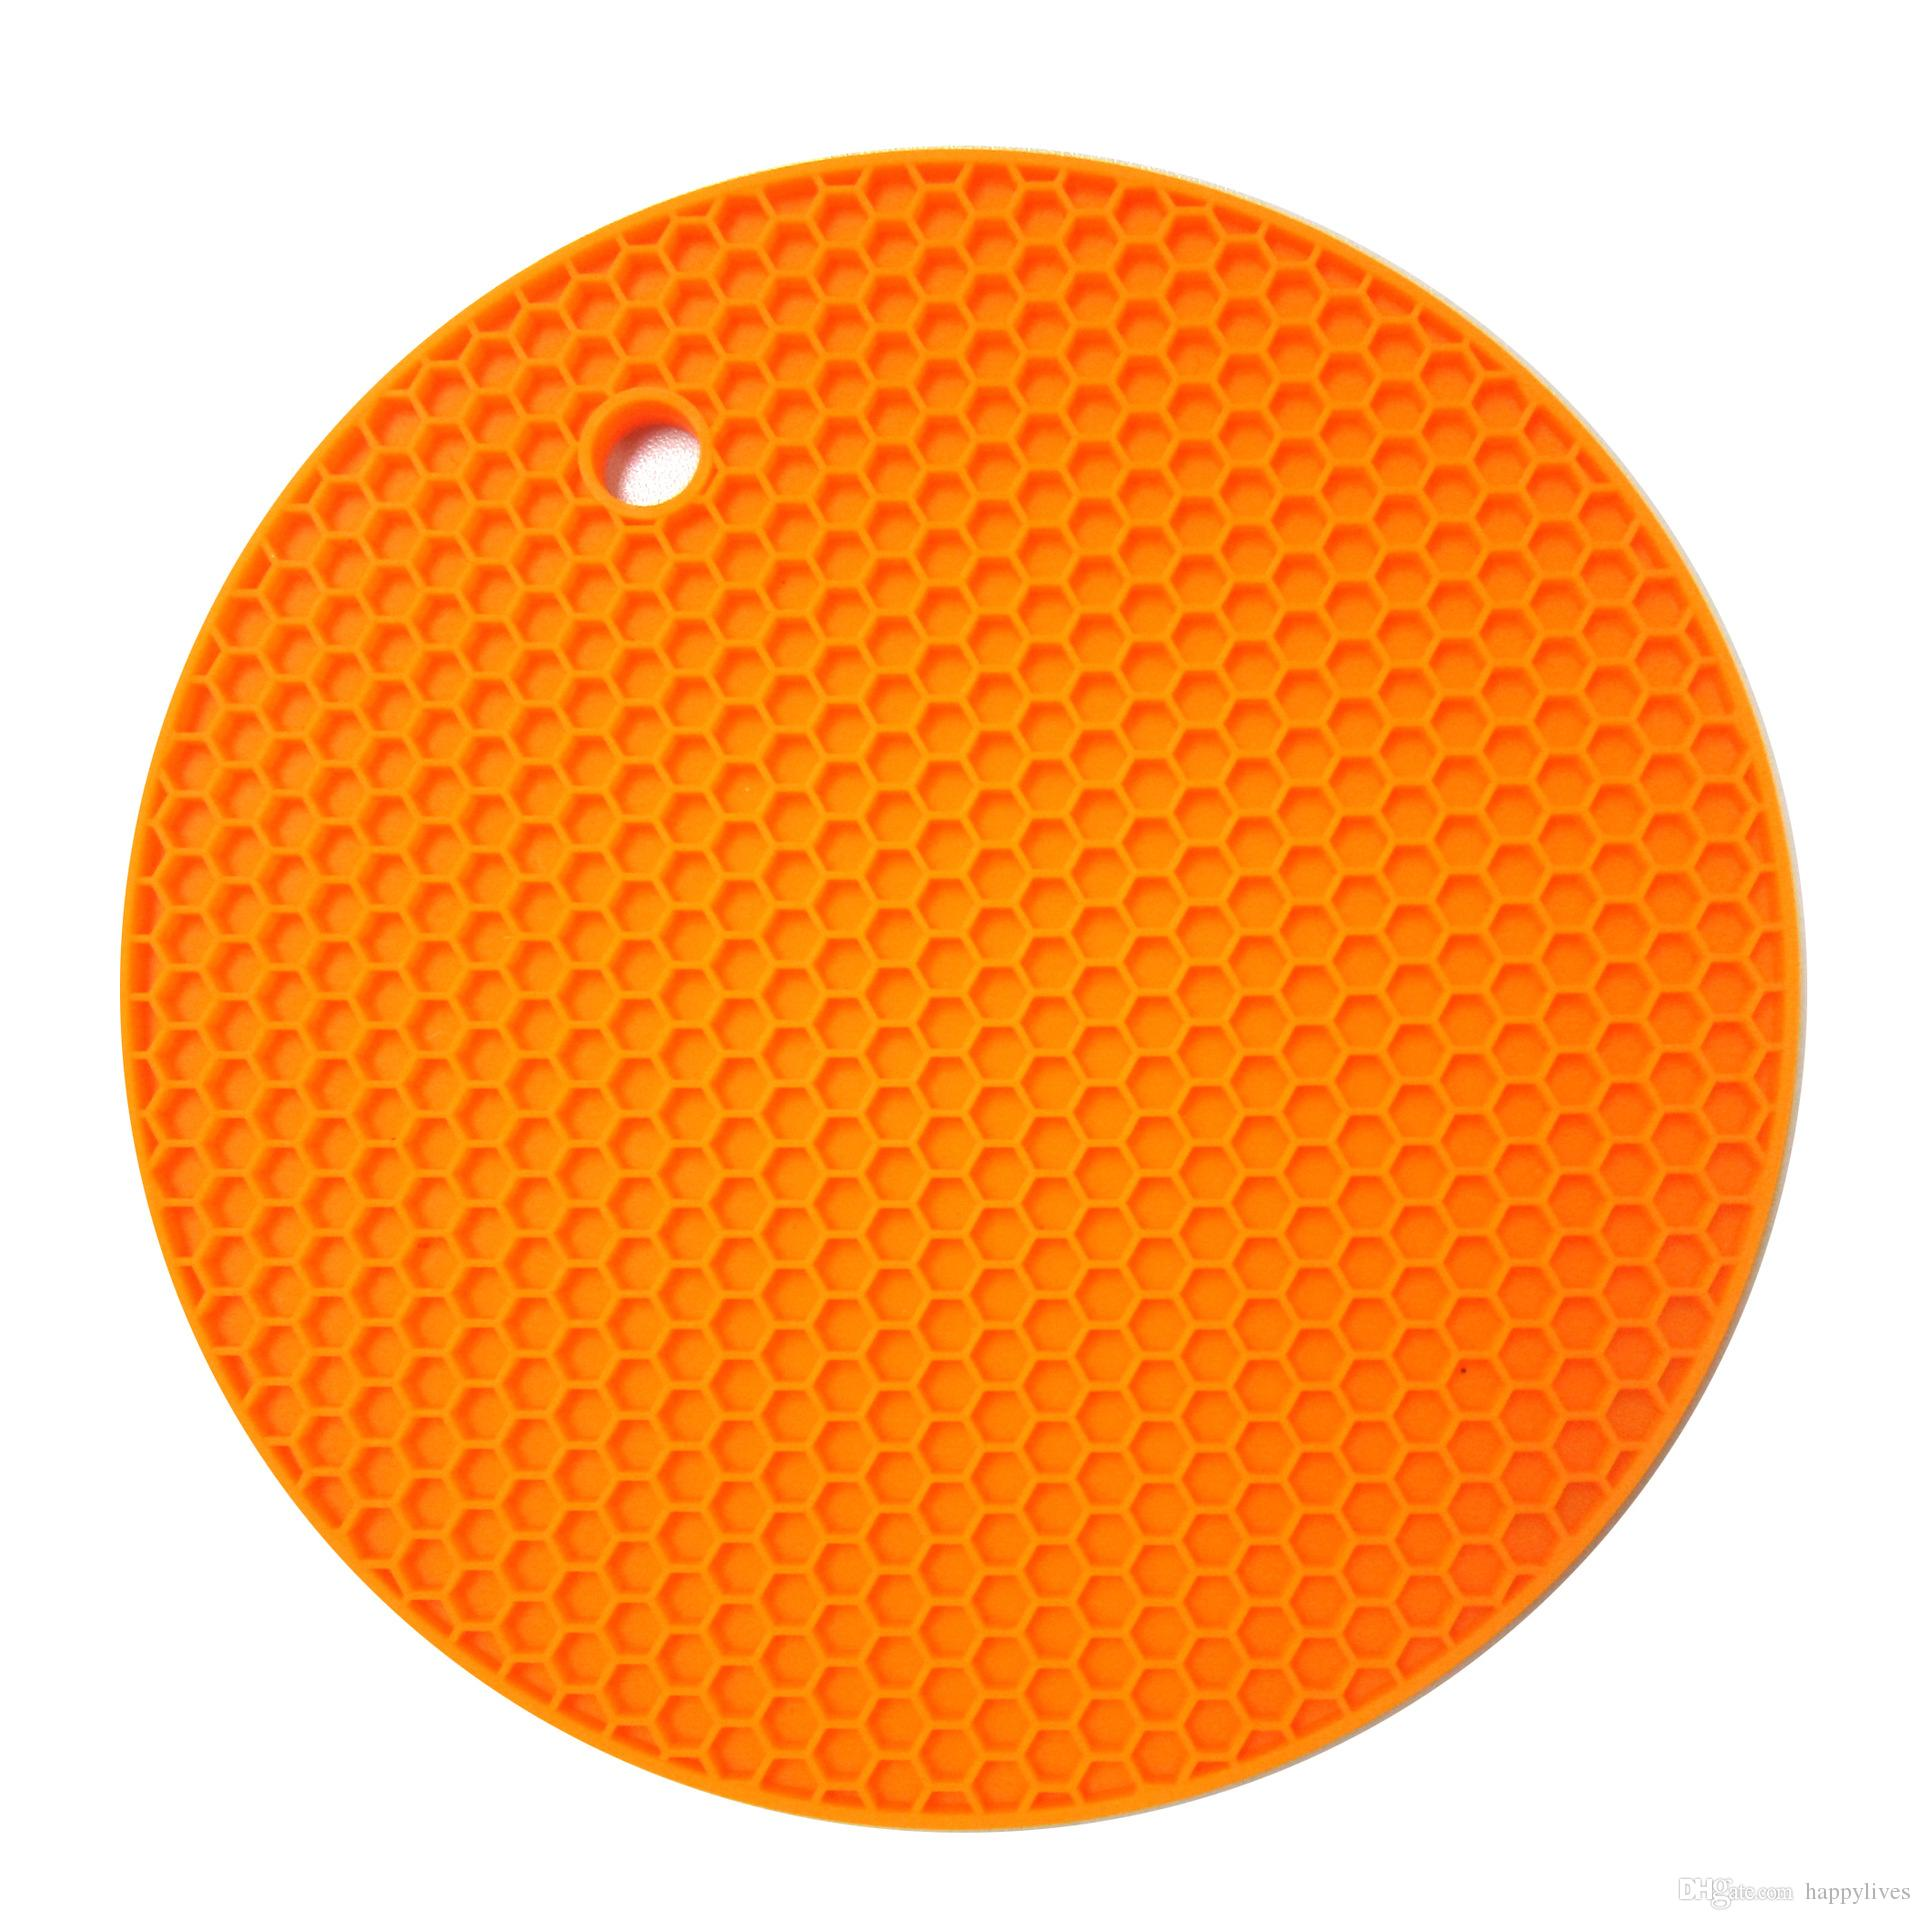 Tabelle Silikon-Auflage Silikon-Anti-Rutsch-Heat Resistant Matte Coaster Kissen Tischset Topflappen Küchenzubehör Kochgeräte